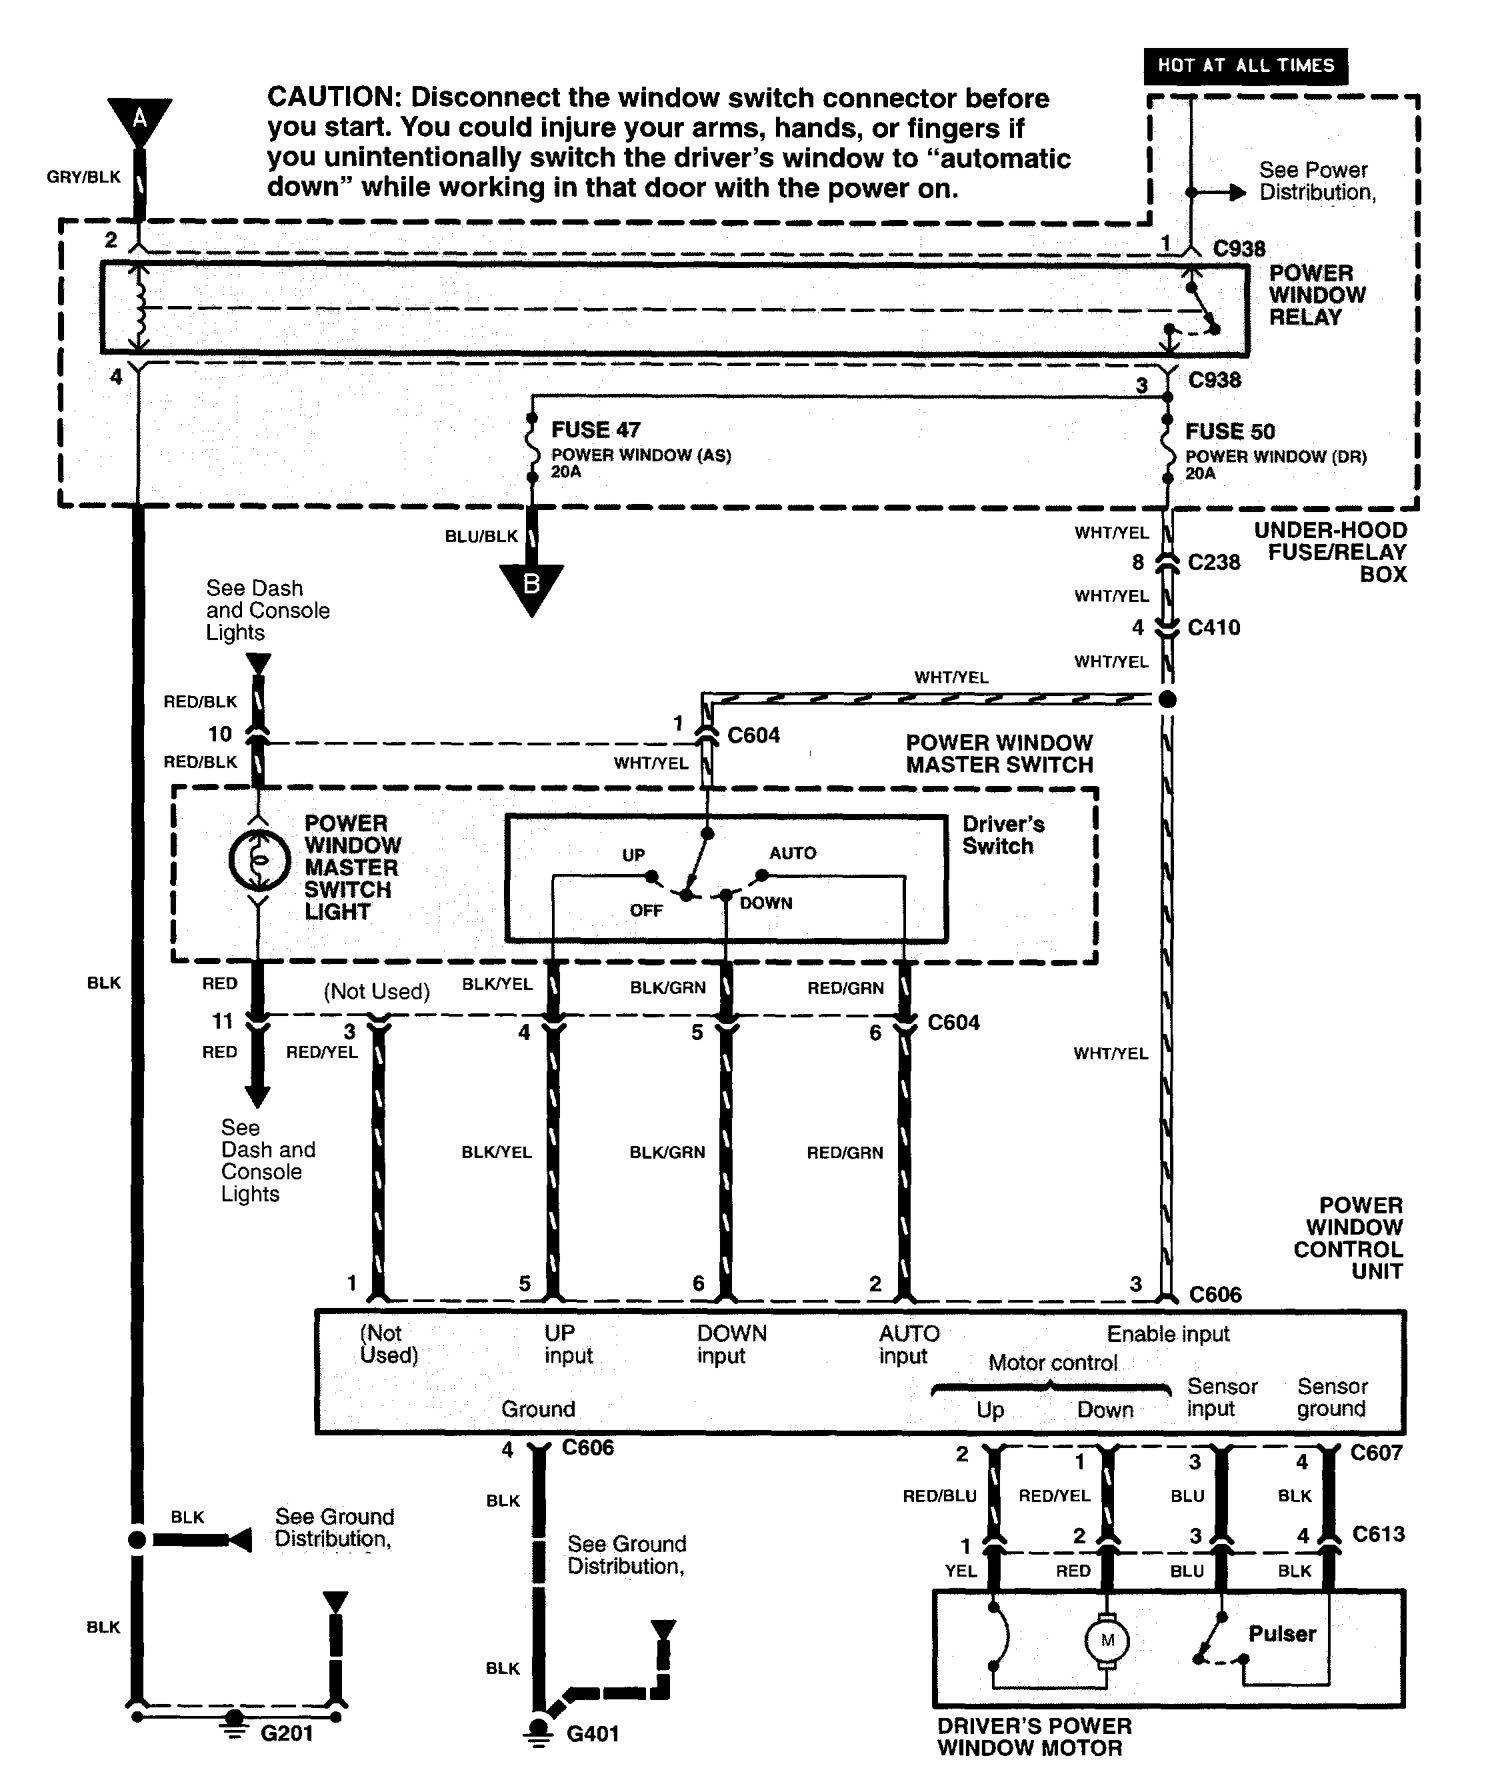 hight resolution of 04 acura mdx fuse box diagram 08 buick lucerne fuse box 2004 acura mdx radio fuse location 2004 acura mdx amp wiring diagram